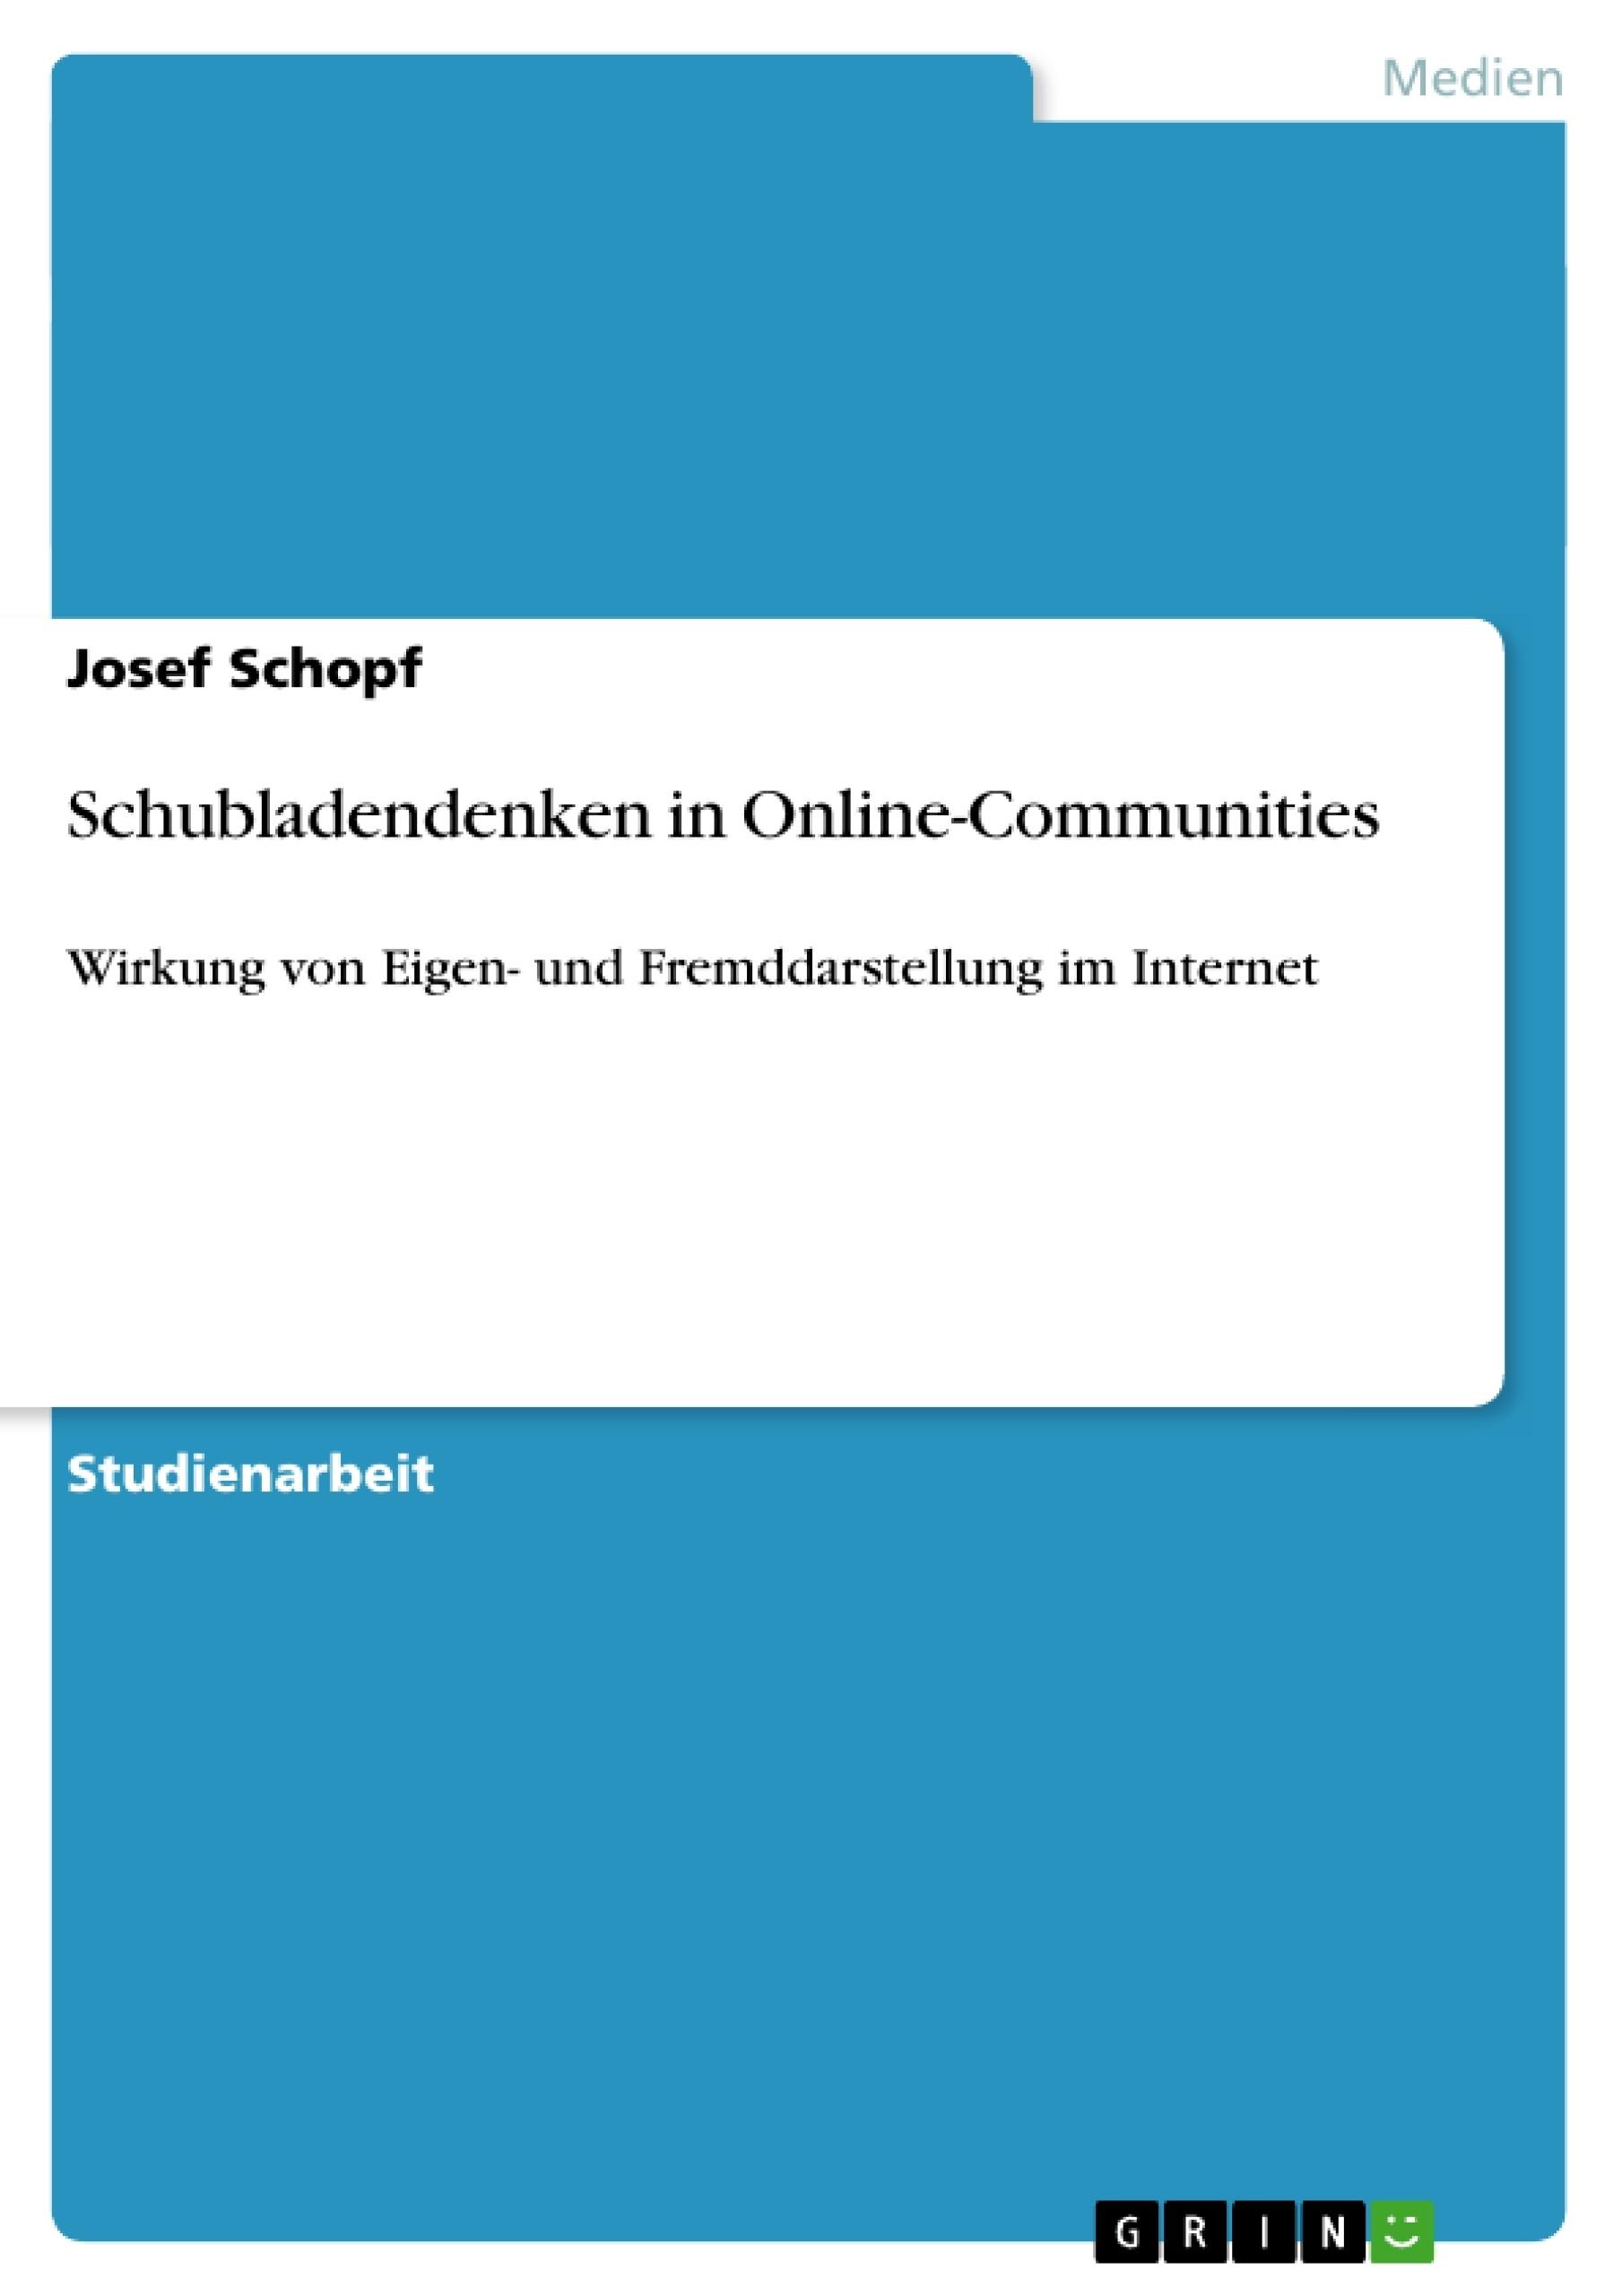 Titel: Schubladendenken in Online-Communities